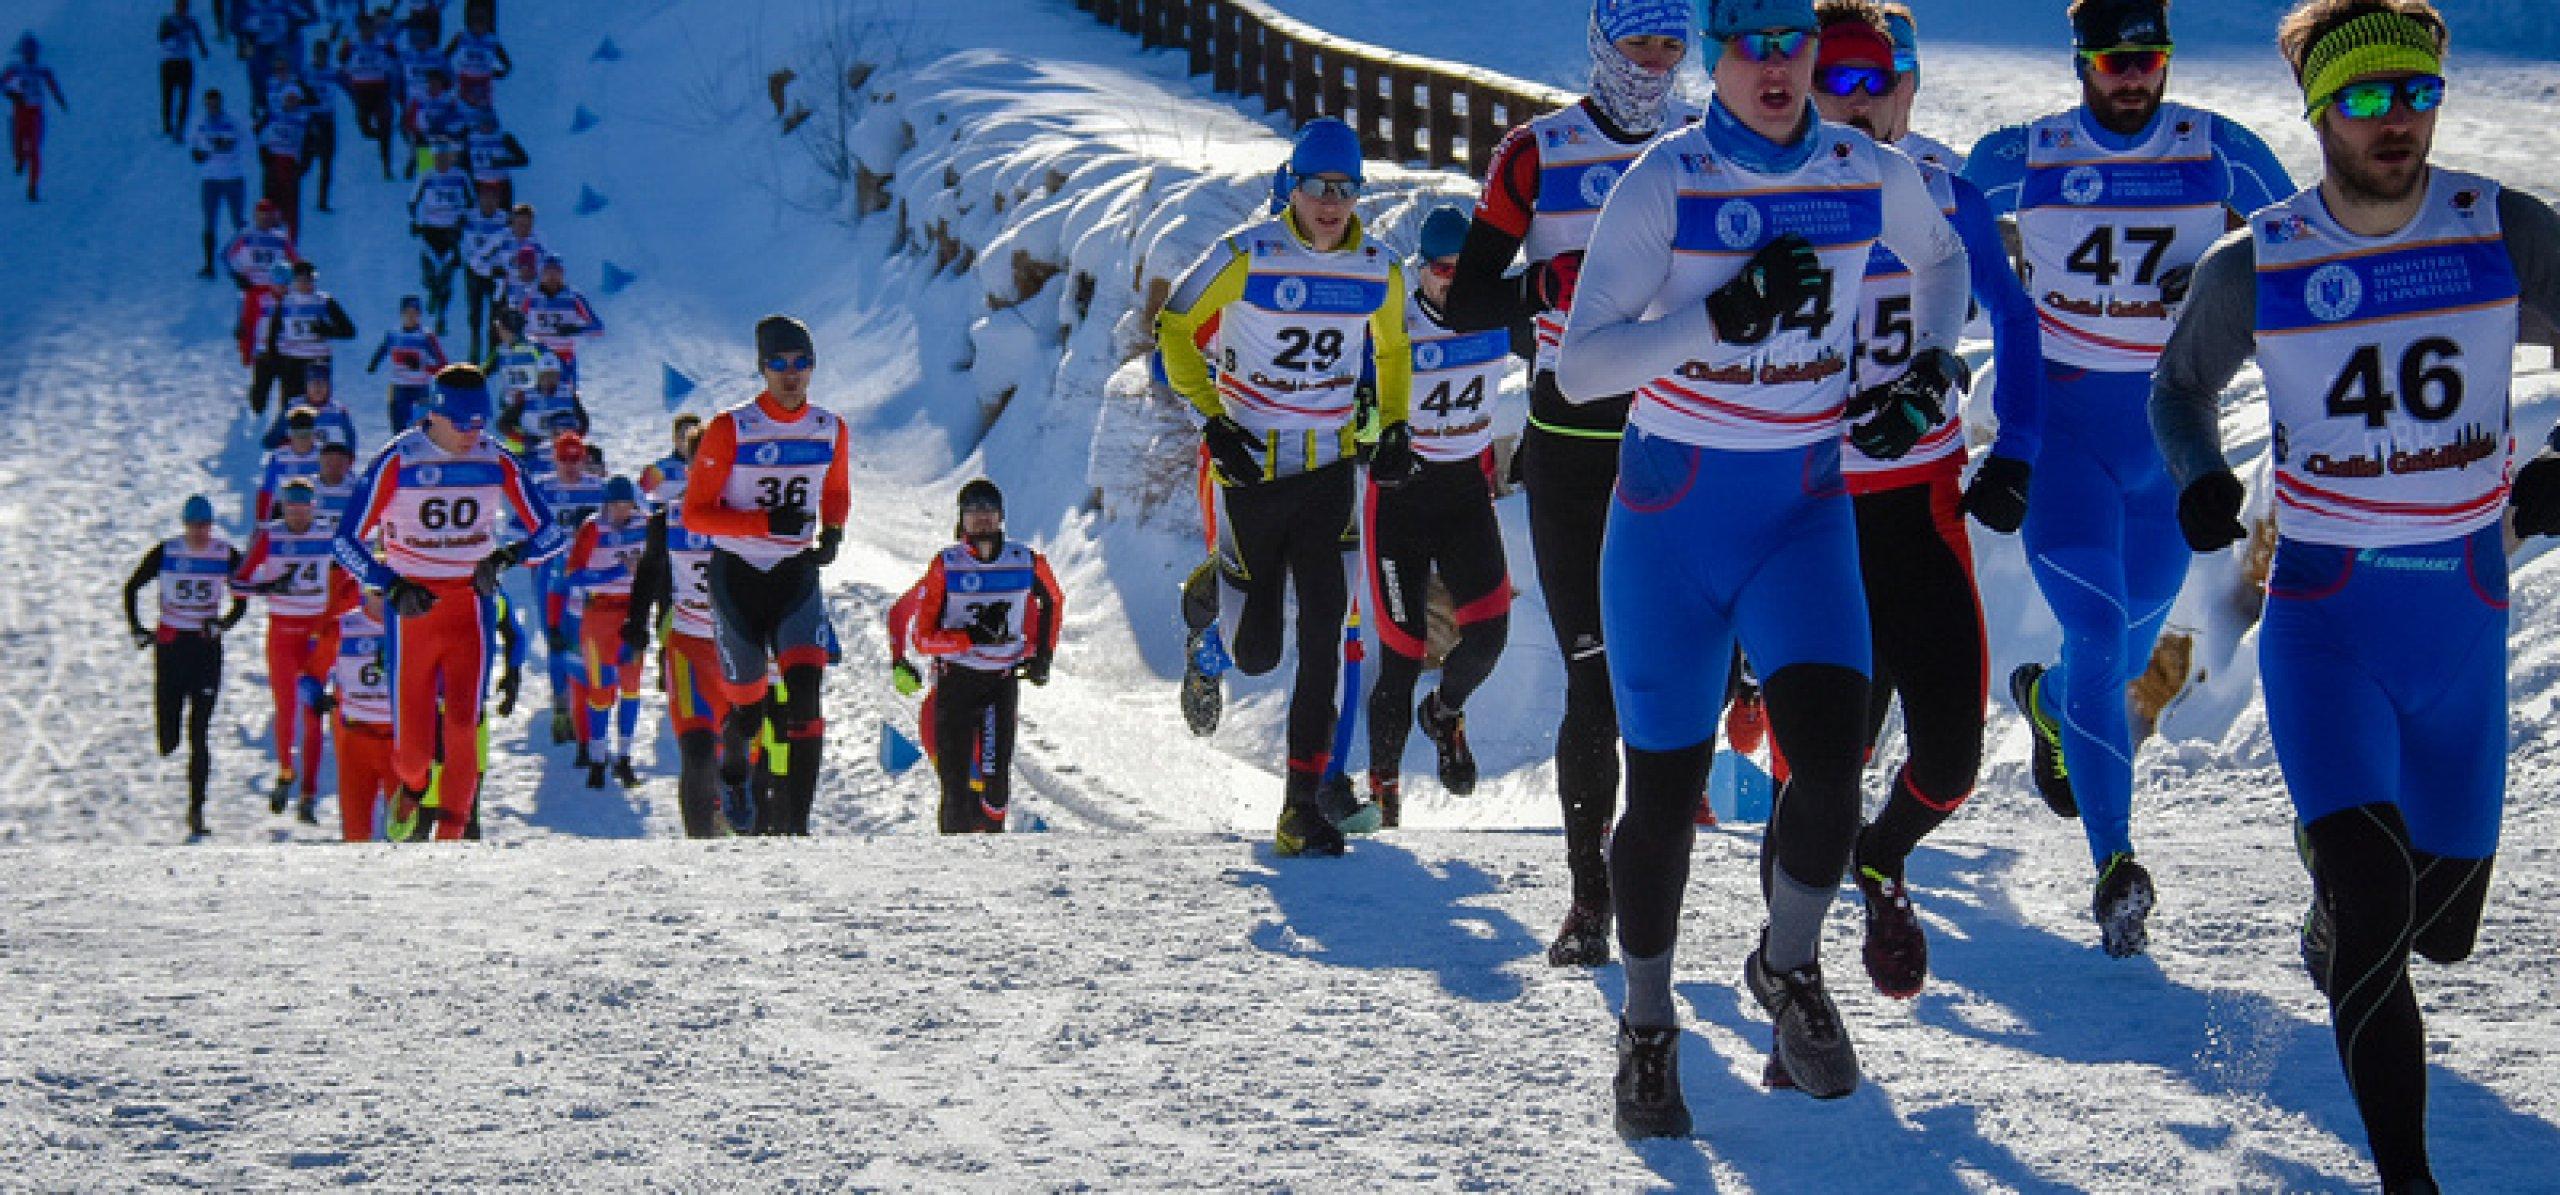 wintertriathlon-cheile-gradistei-alergare